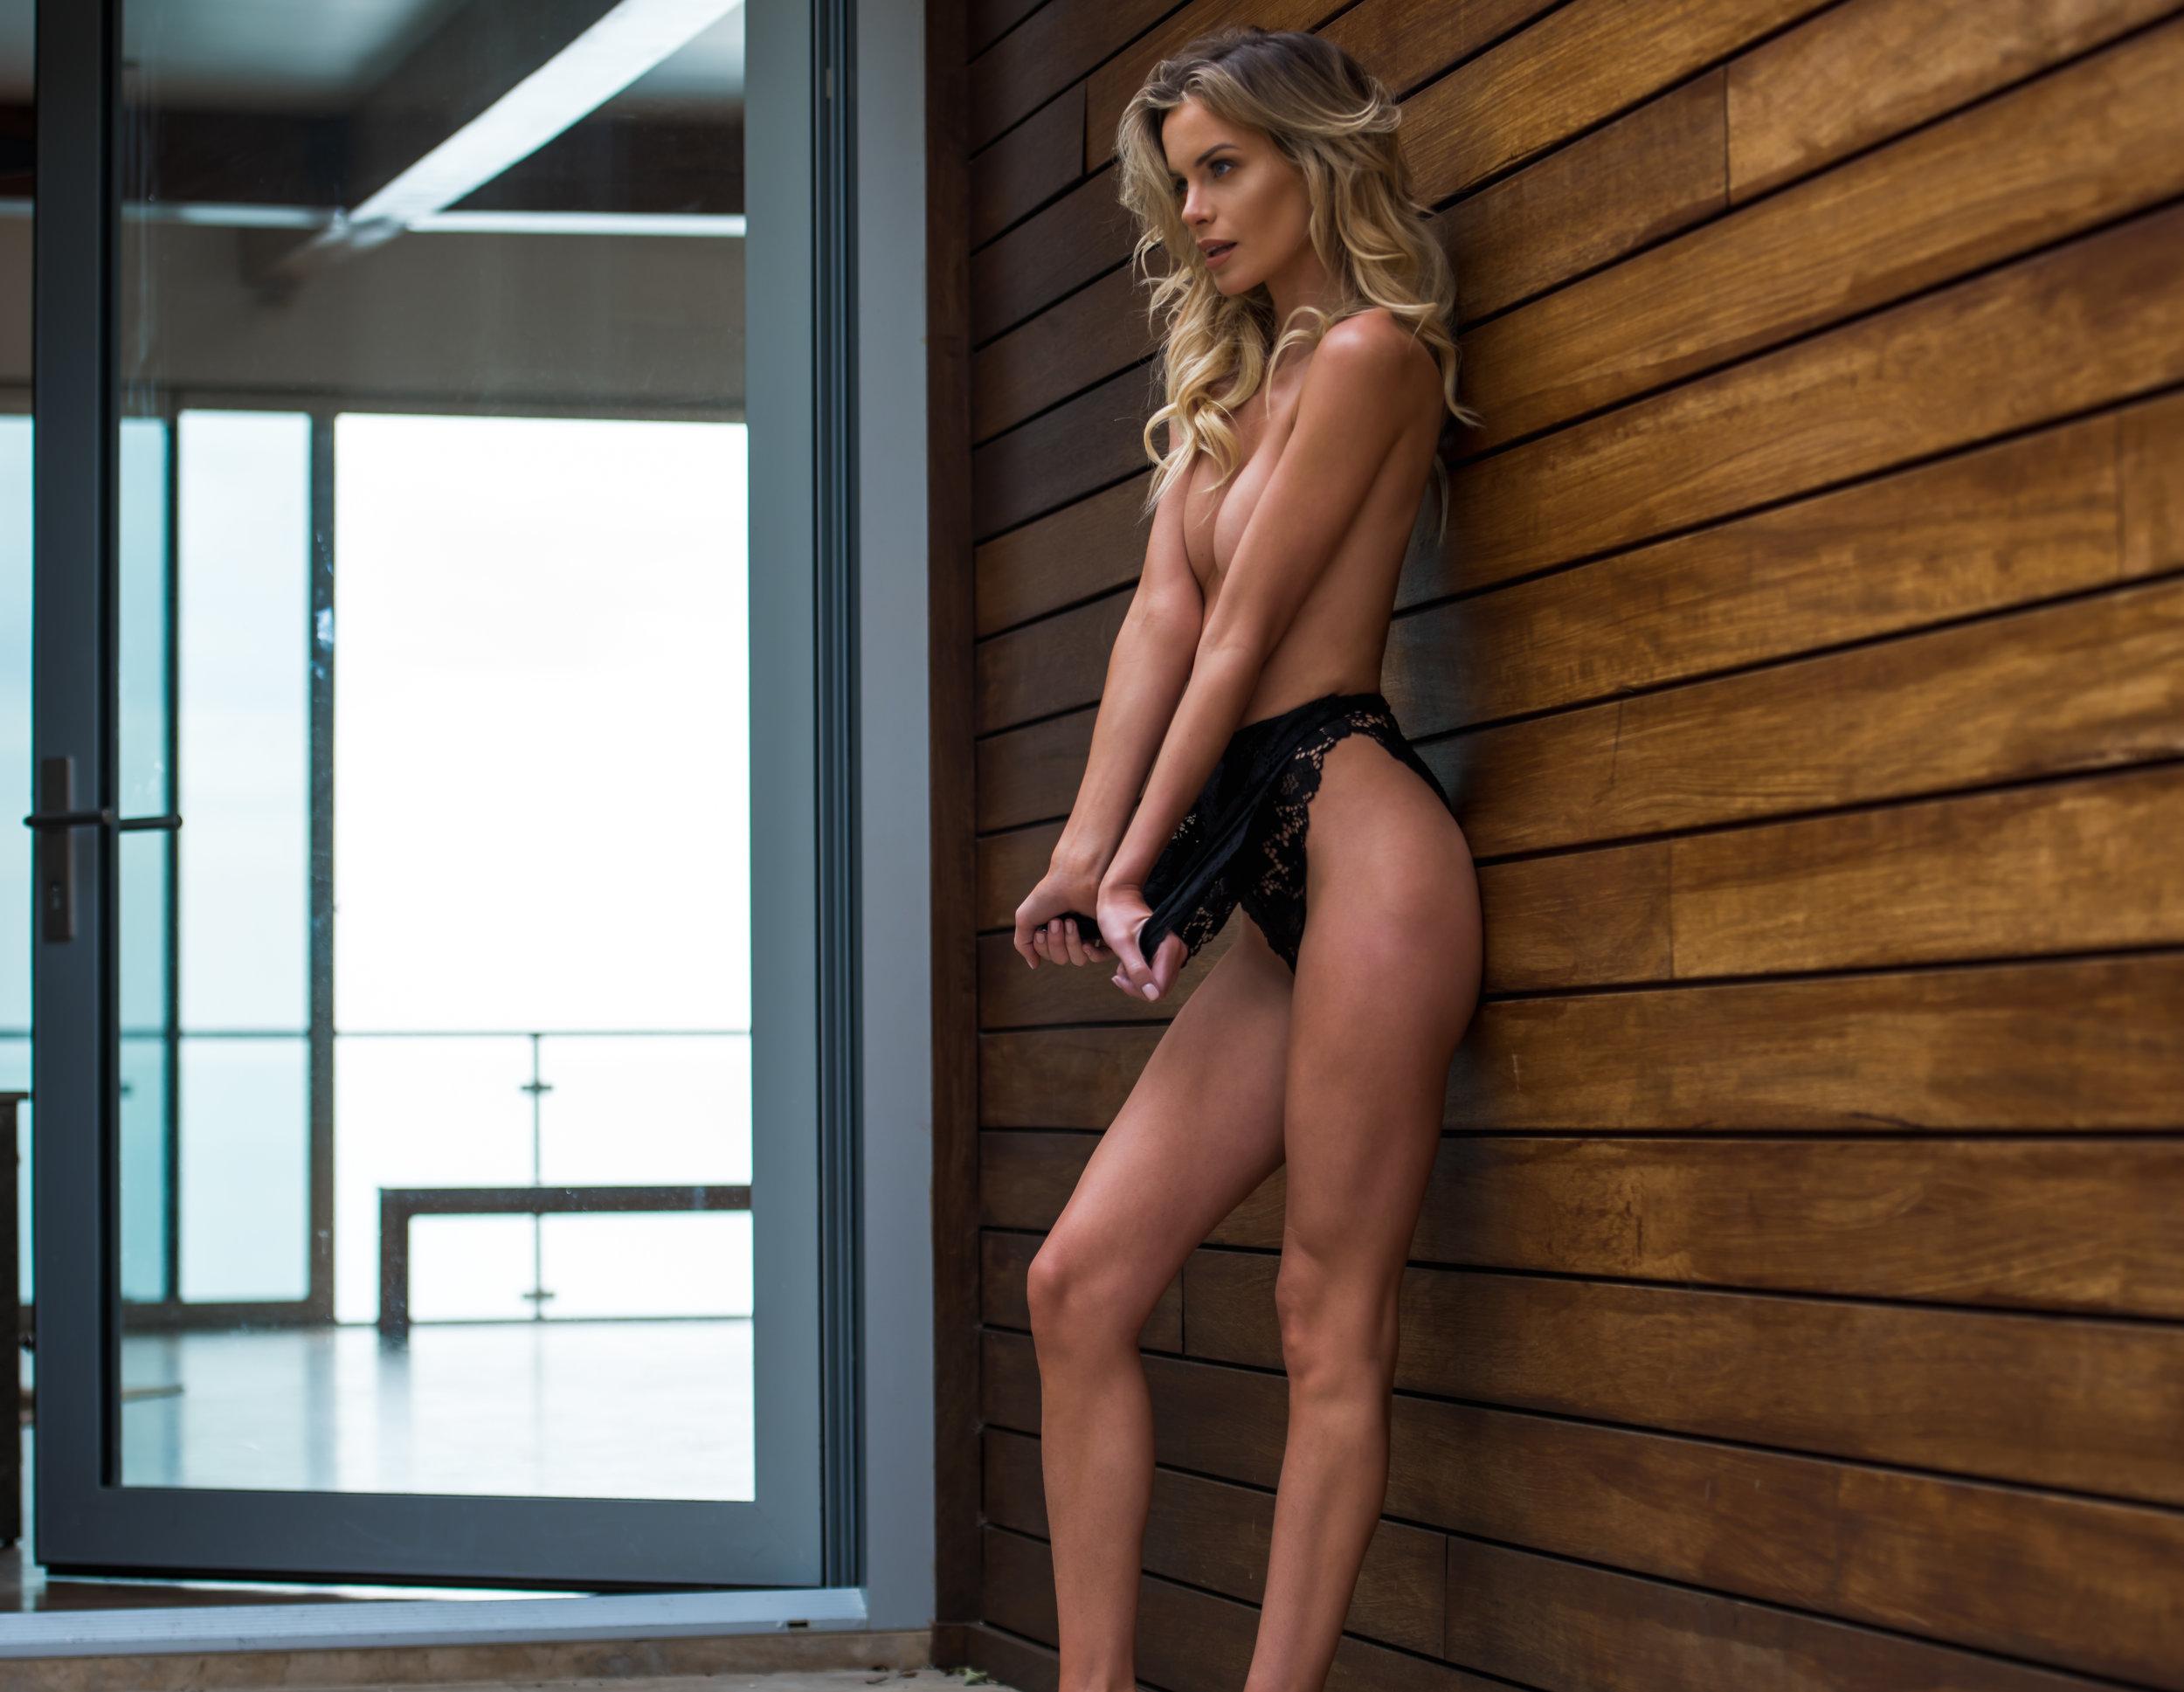 One Model Mission's Katy Johnson poses in Malibu Mansion